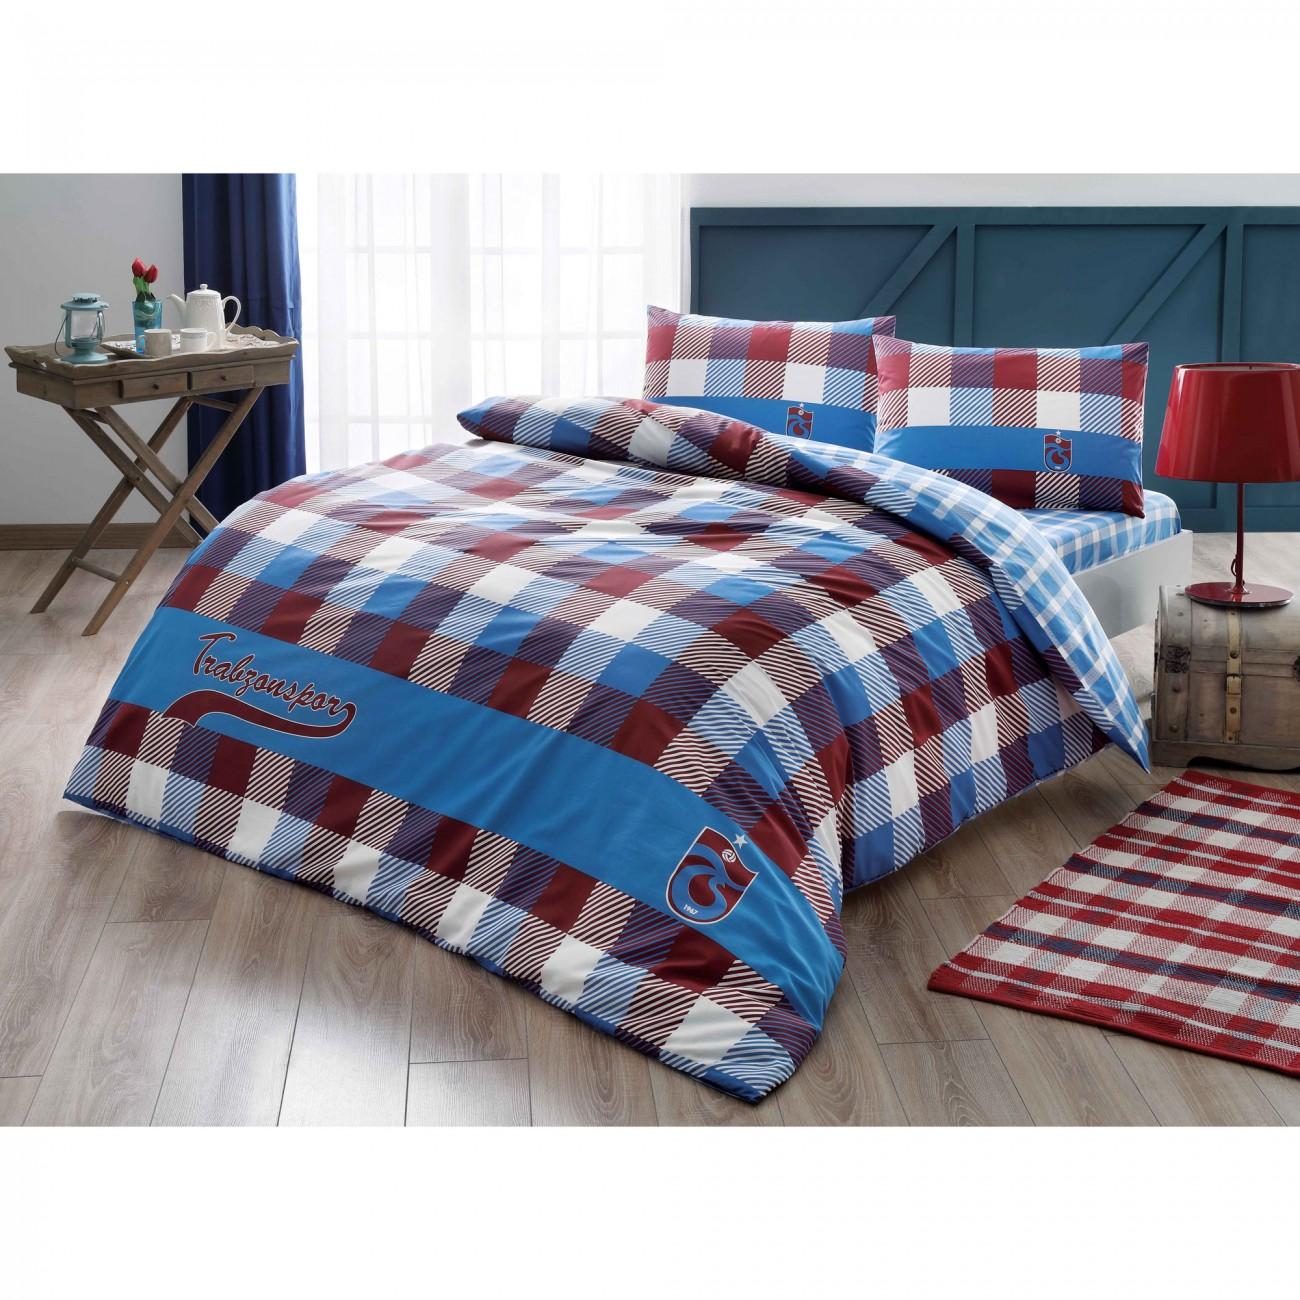 schlafzimmer tac trabzonspor ekose bettw sche set 200x220. Black Bedroom Furniture Sets. Home Design Ideas